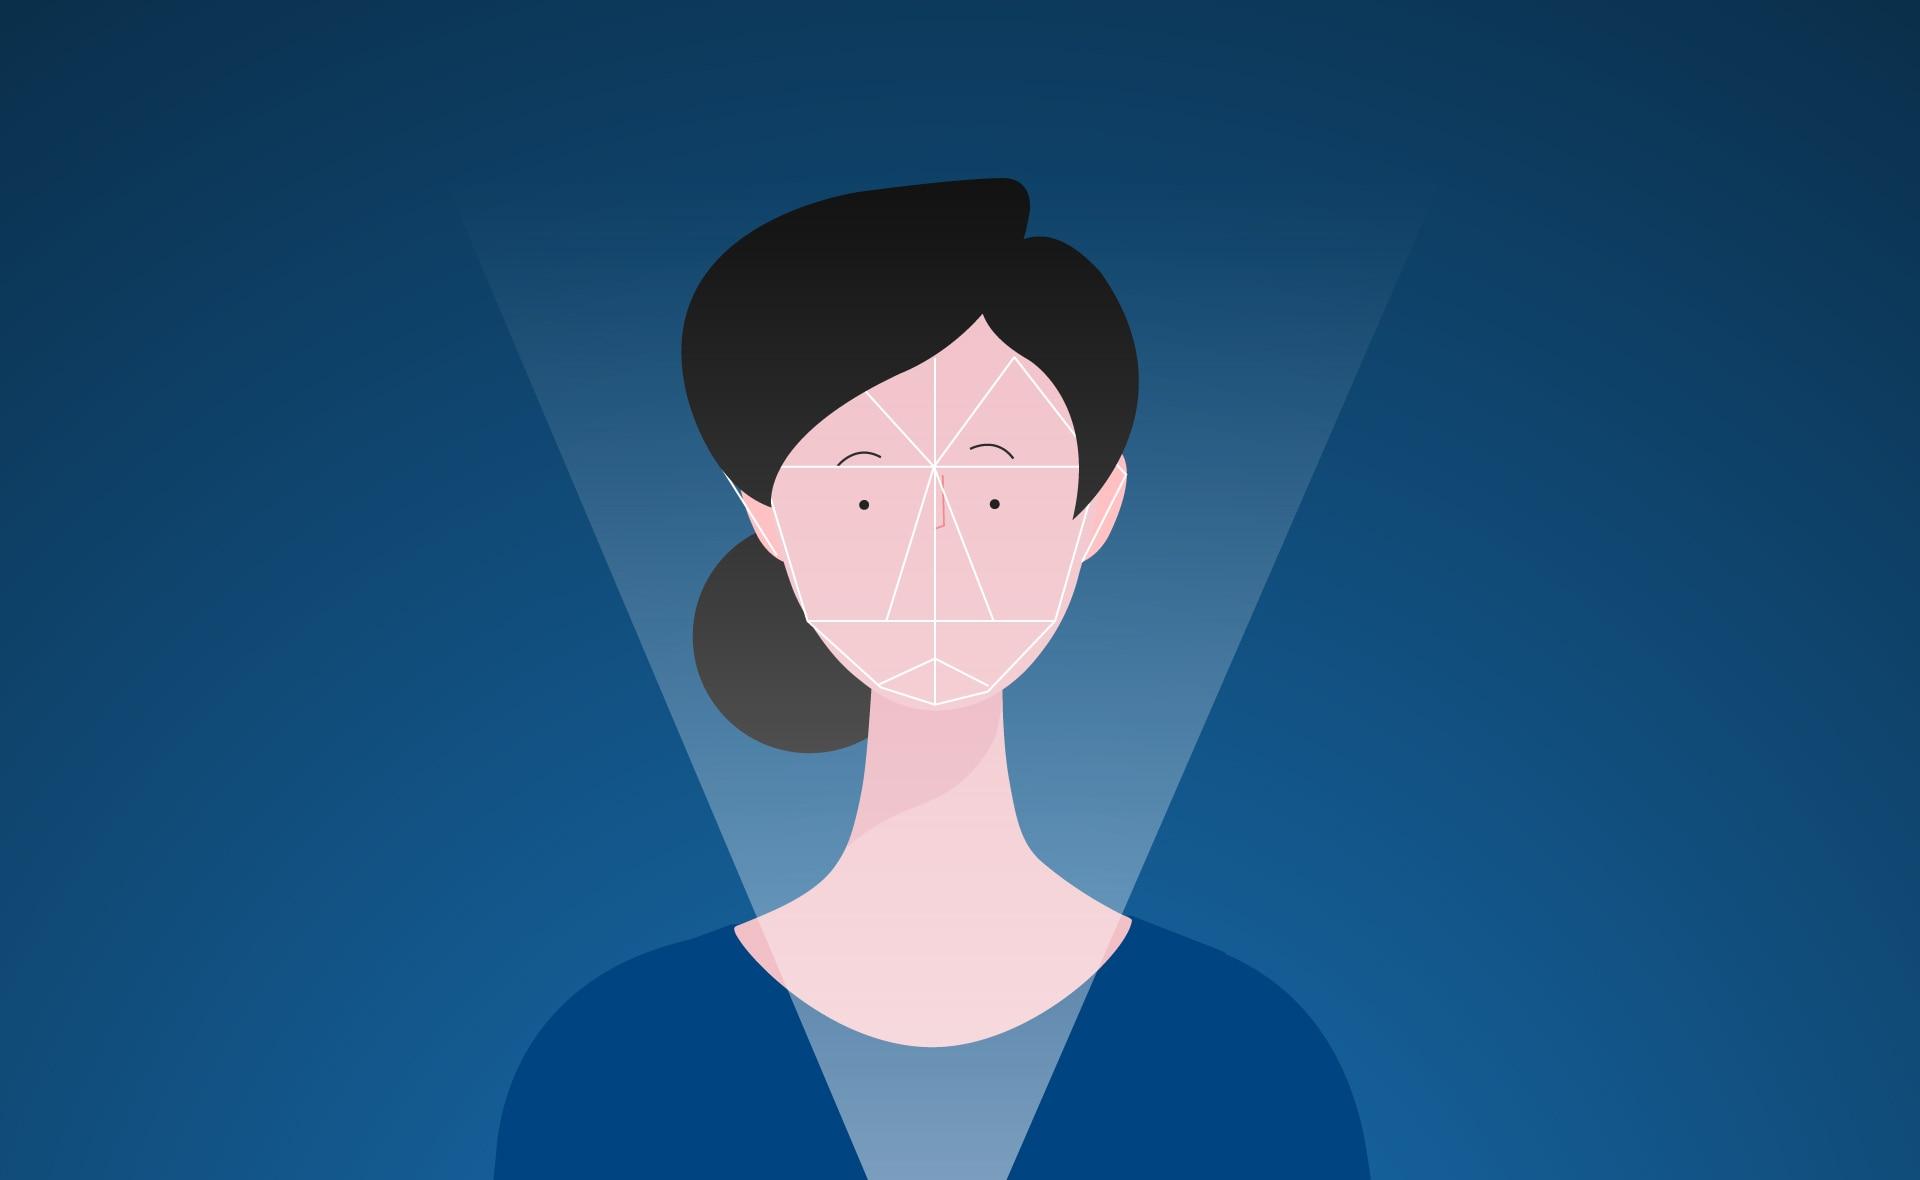 BBVA-biometria-firma-operaciones-cara-huella-voz-ciberseguridad-app-banco